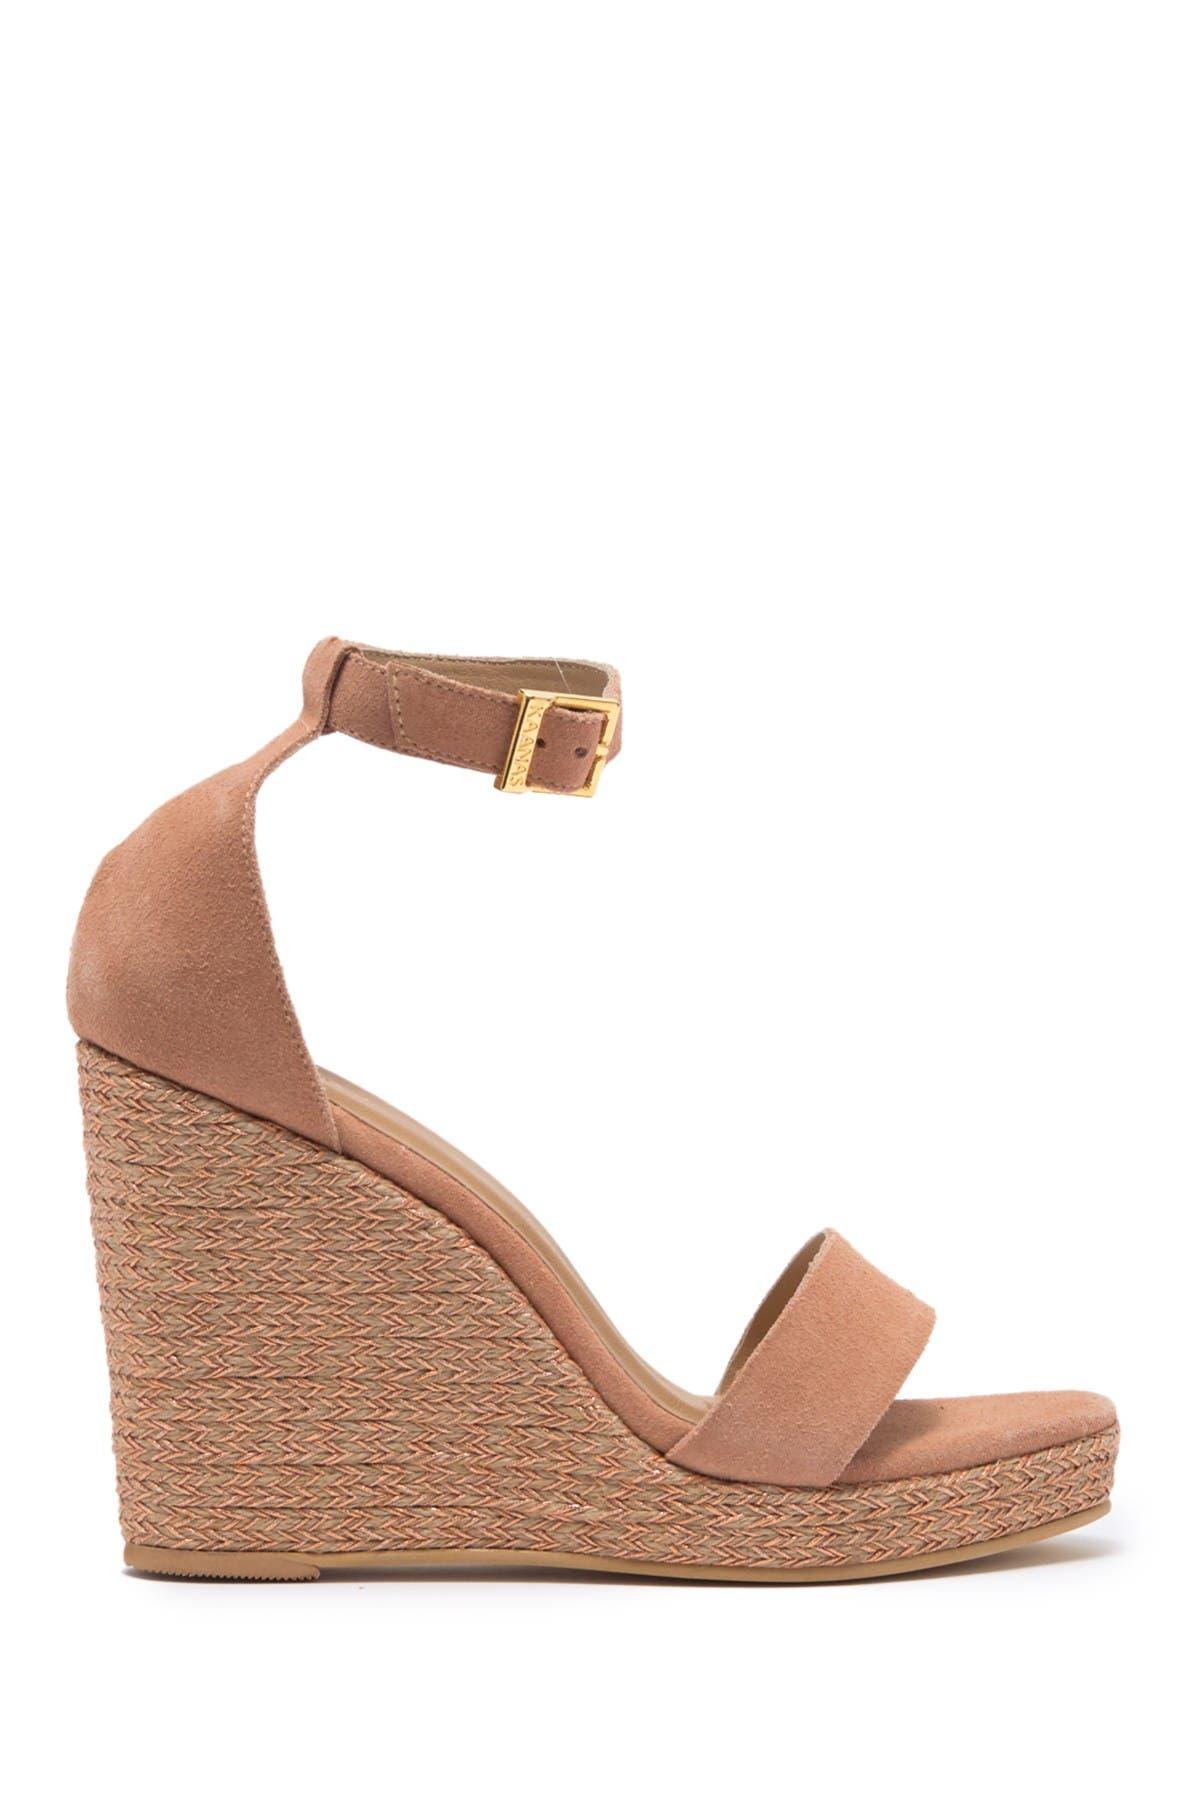 Image of Kaanas Eleuthera Ankle Strap Espadrille Wedge Sandal